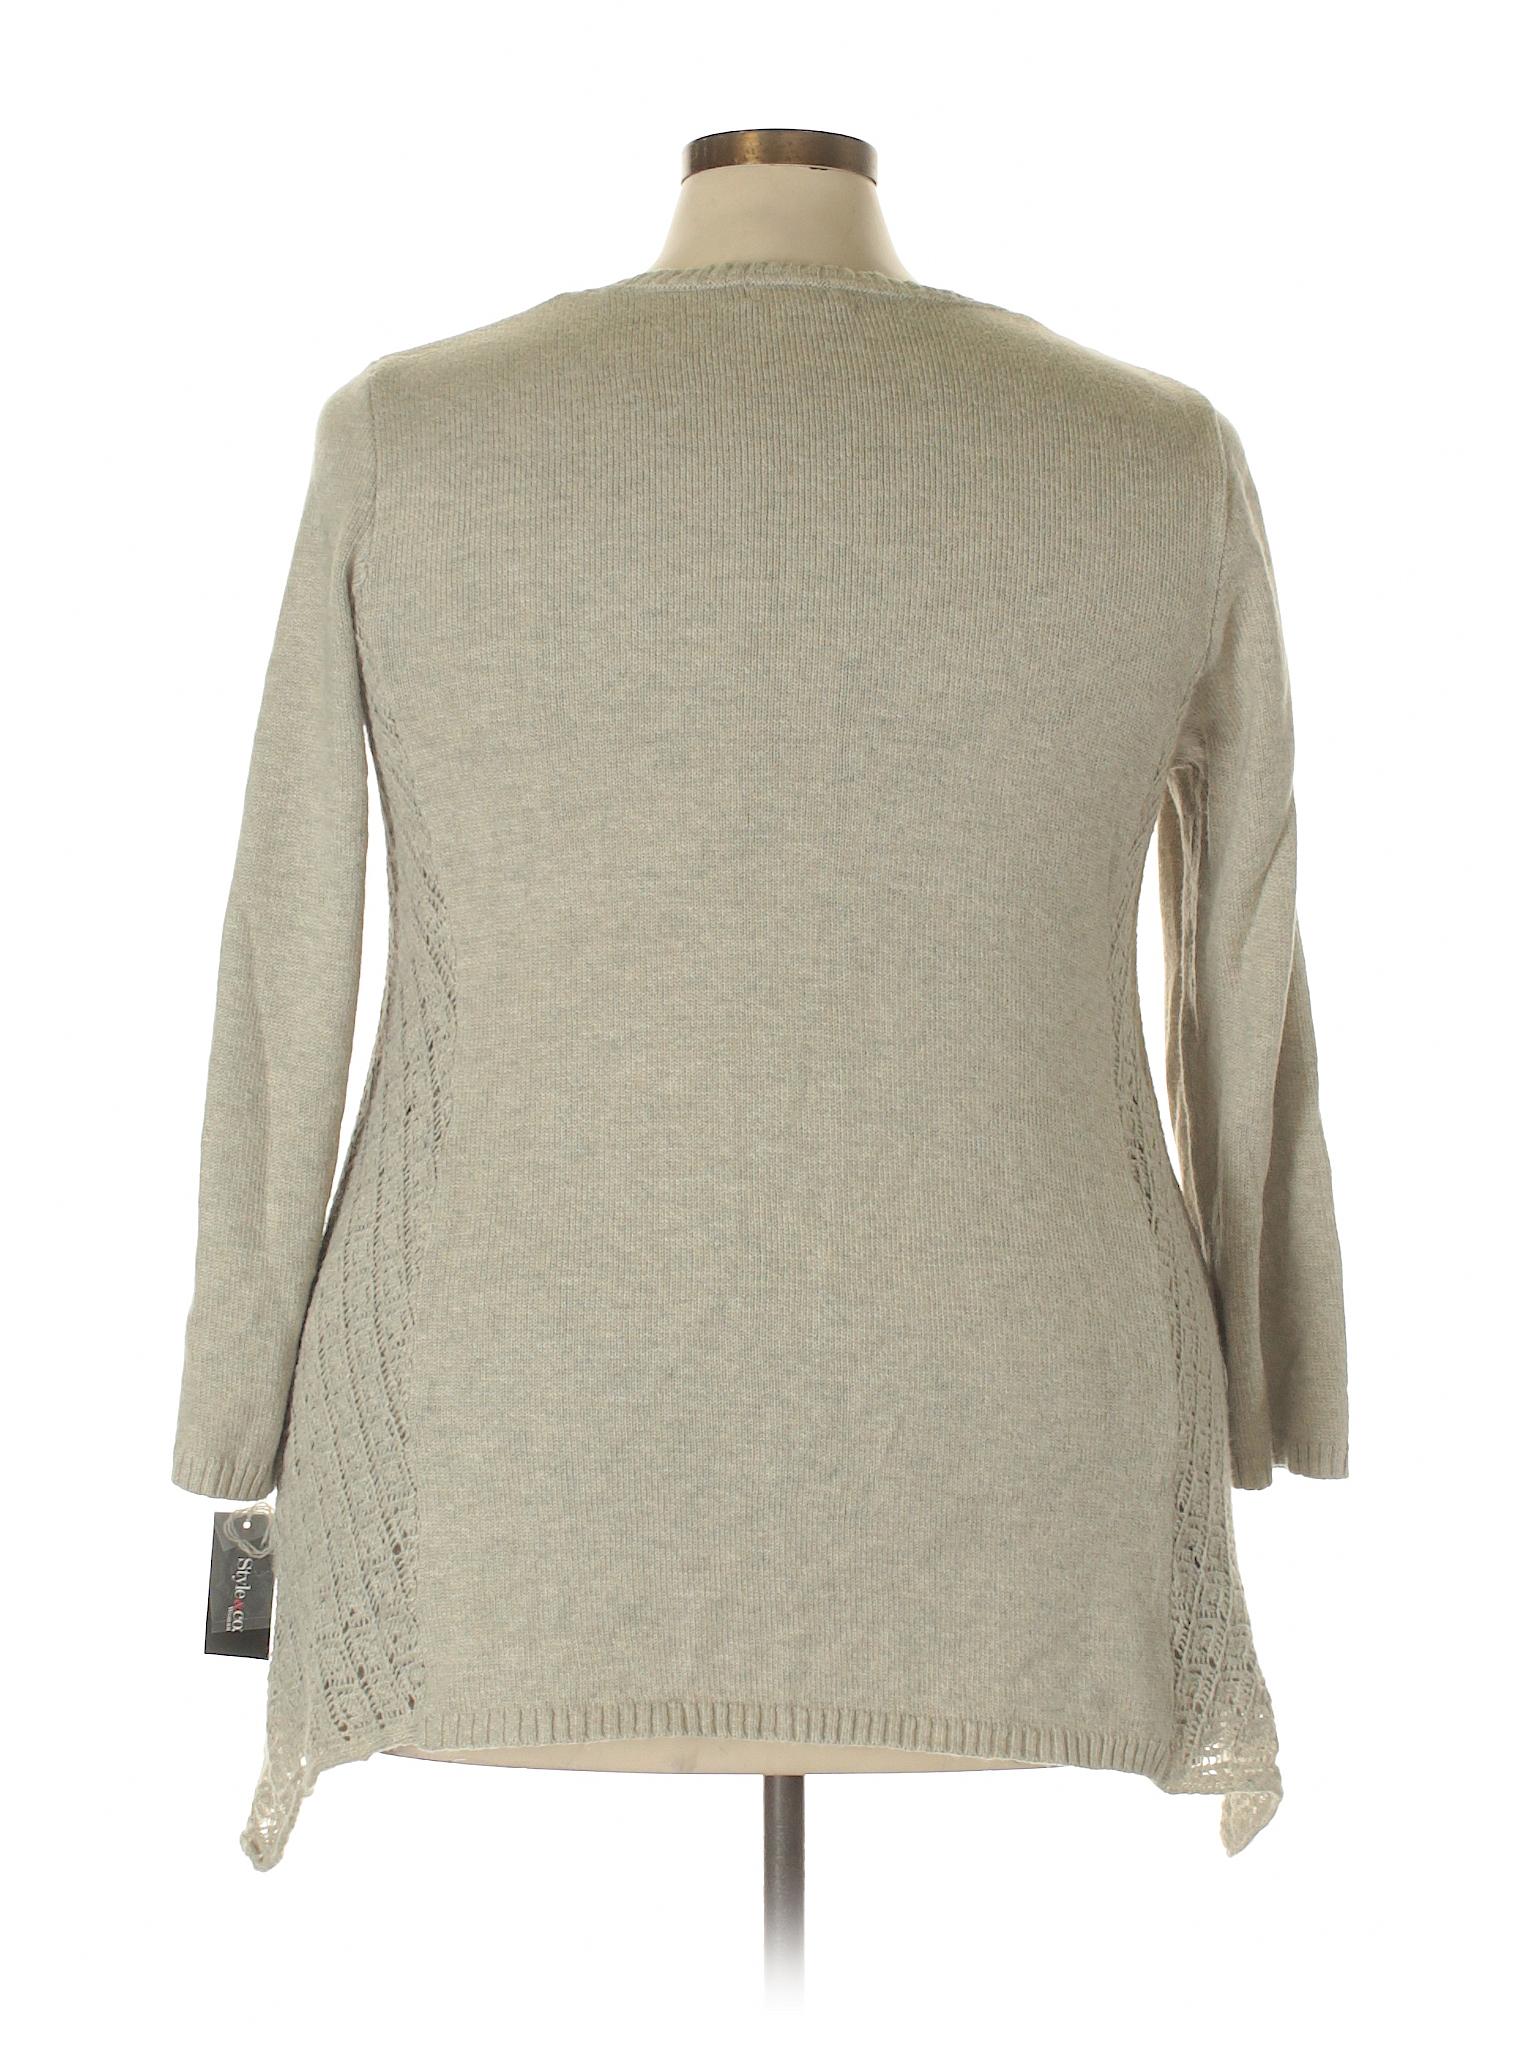 Style Pullover amp;Co Pullover Boutique Style Boutique Sweater amp;Co cITOTqzP